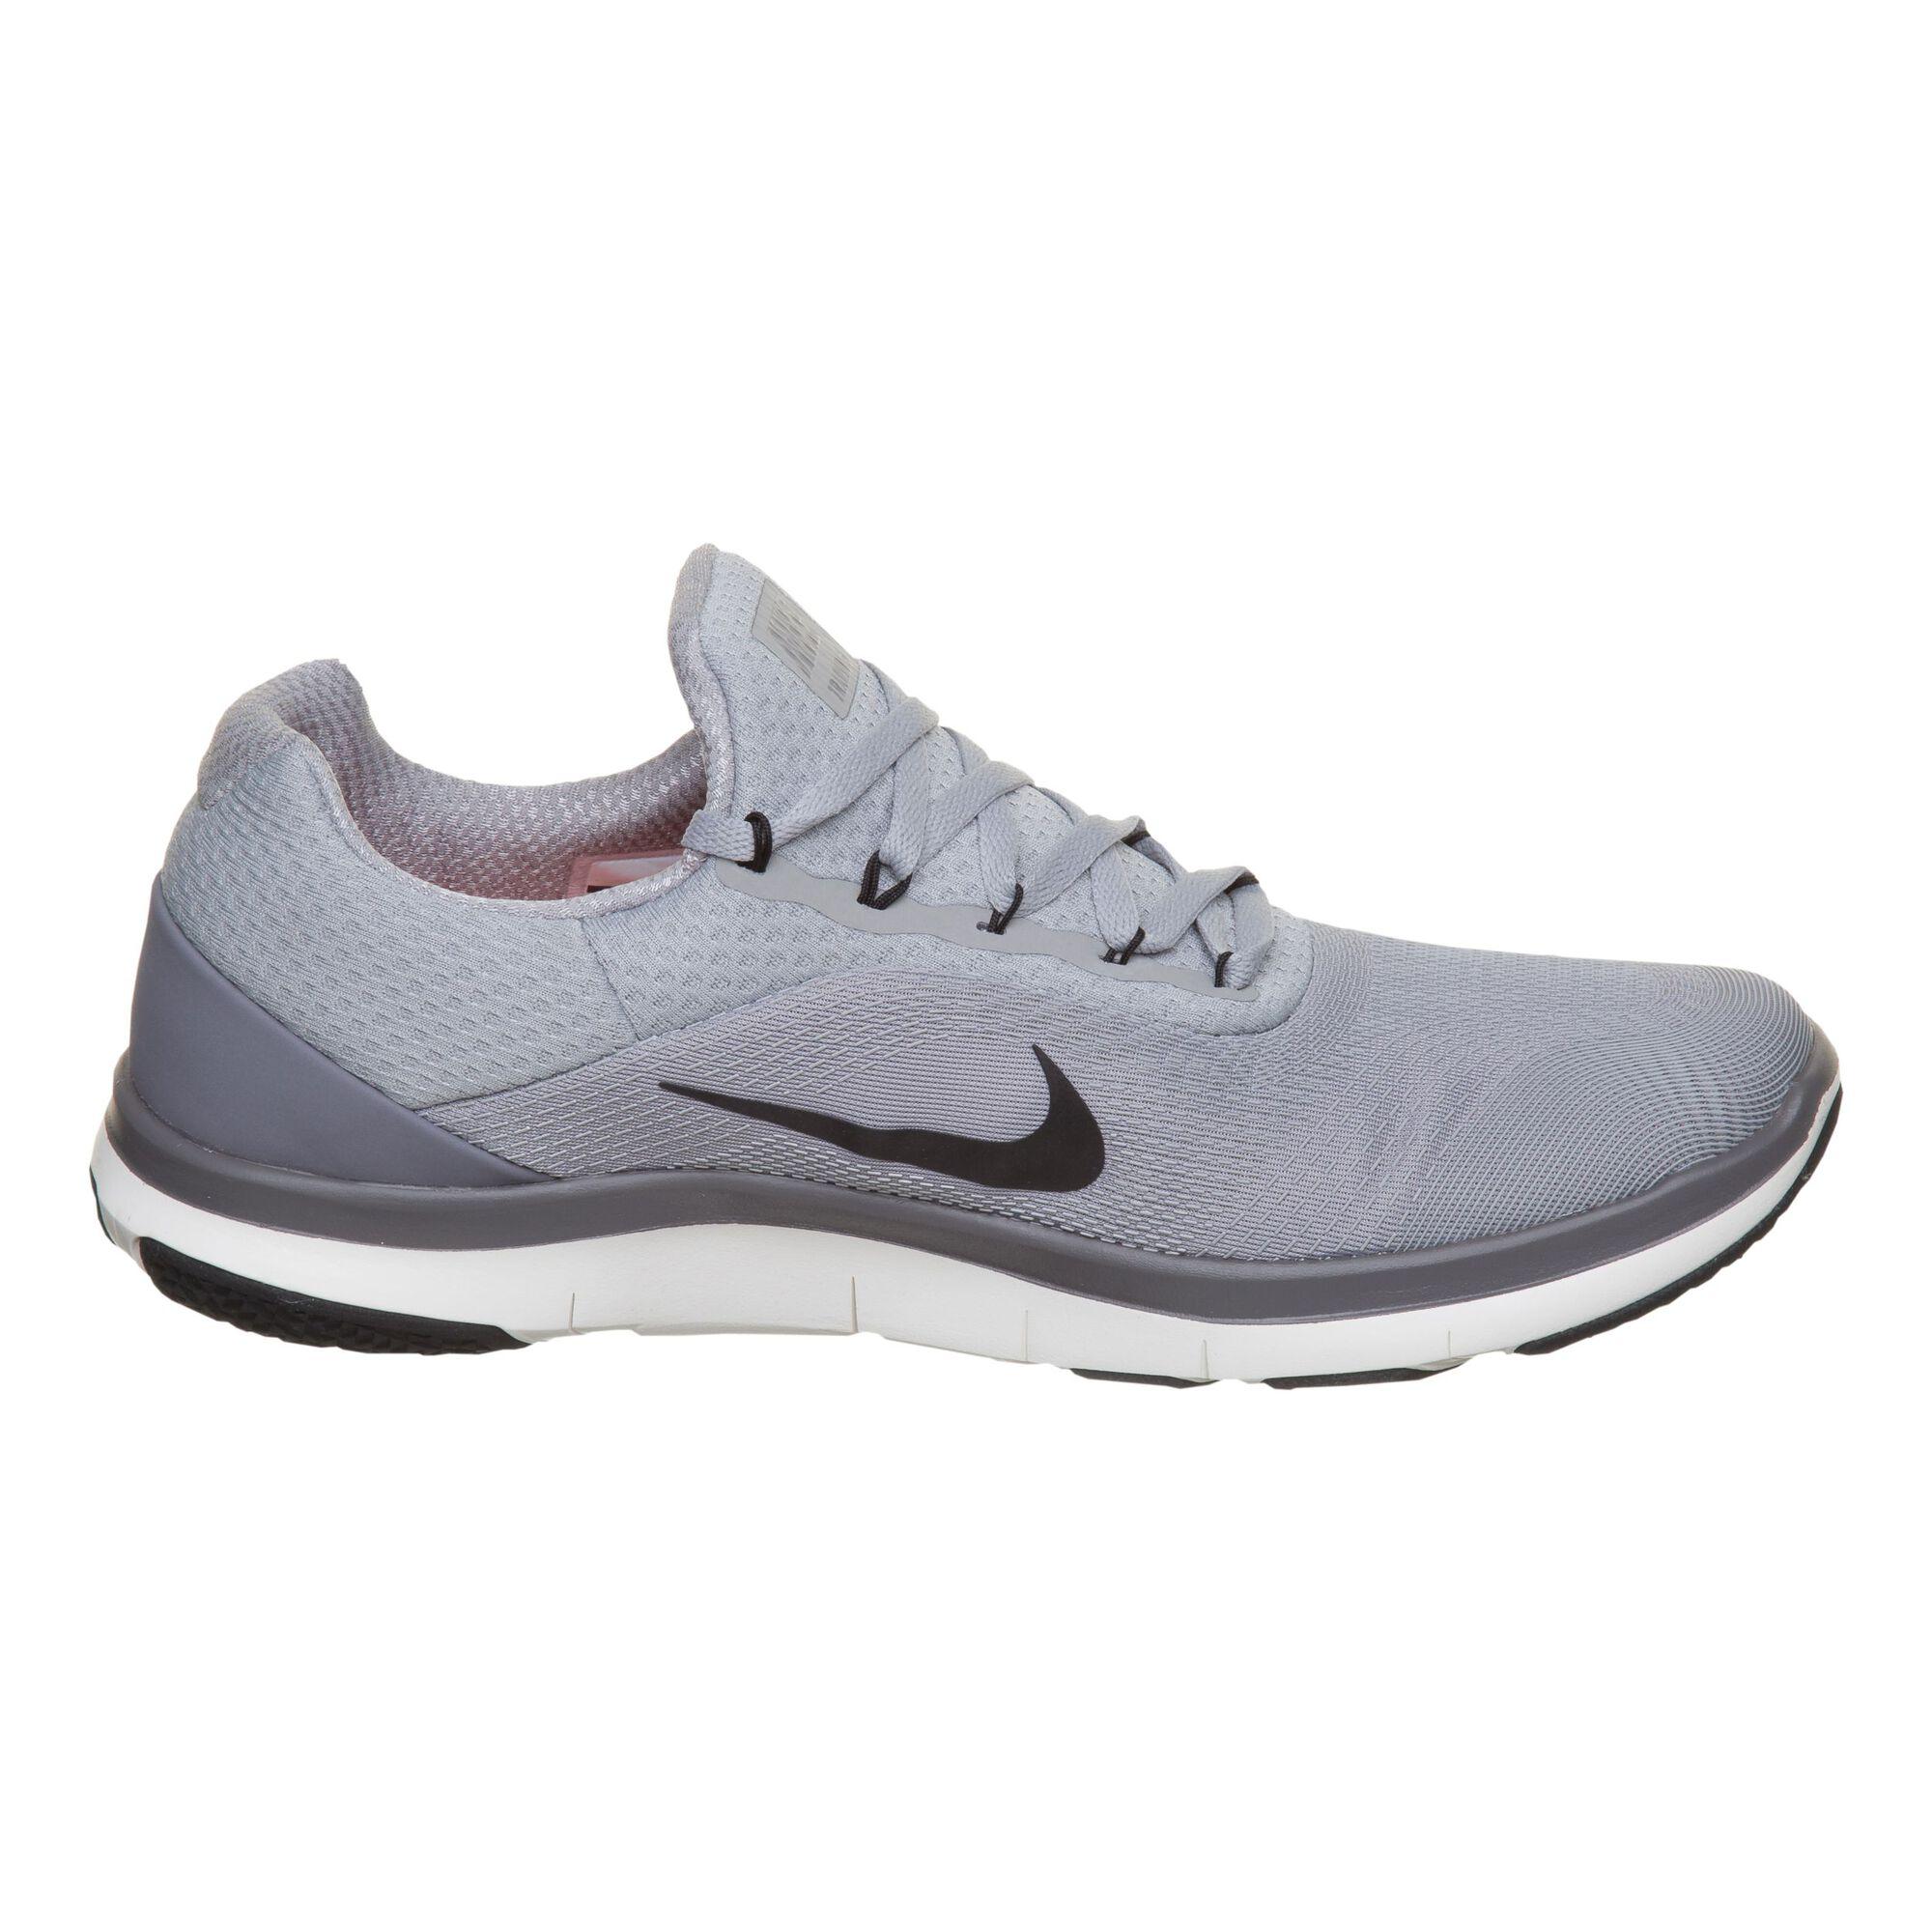 newest 4d106 b94d1 Nike  Nike  Nike  Nike  Nike  Nike  Nike  Nike  Nike  Nike. Free Trainer v7  Men ...